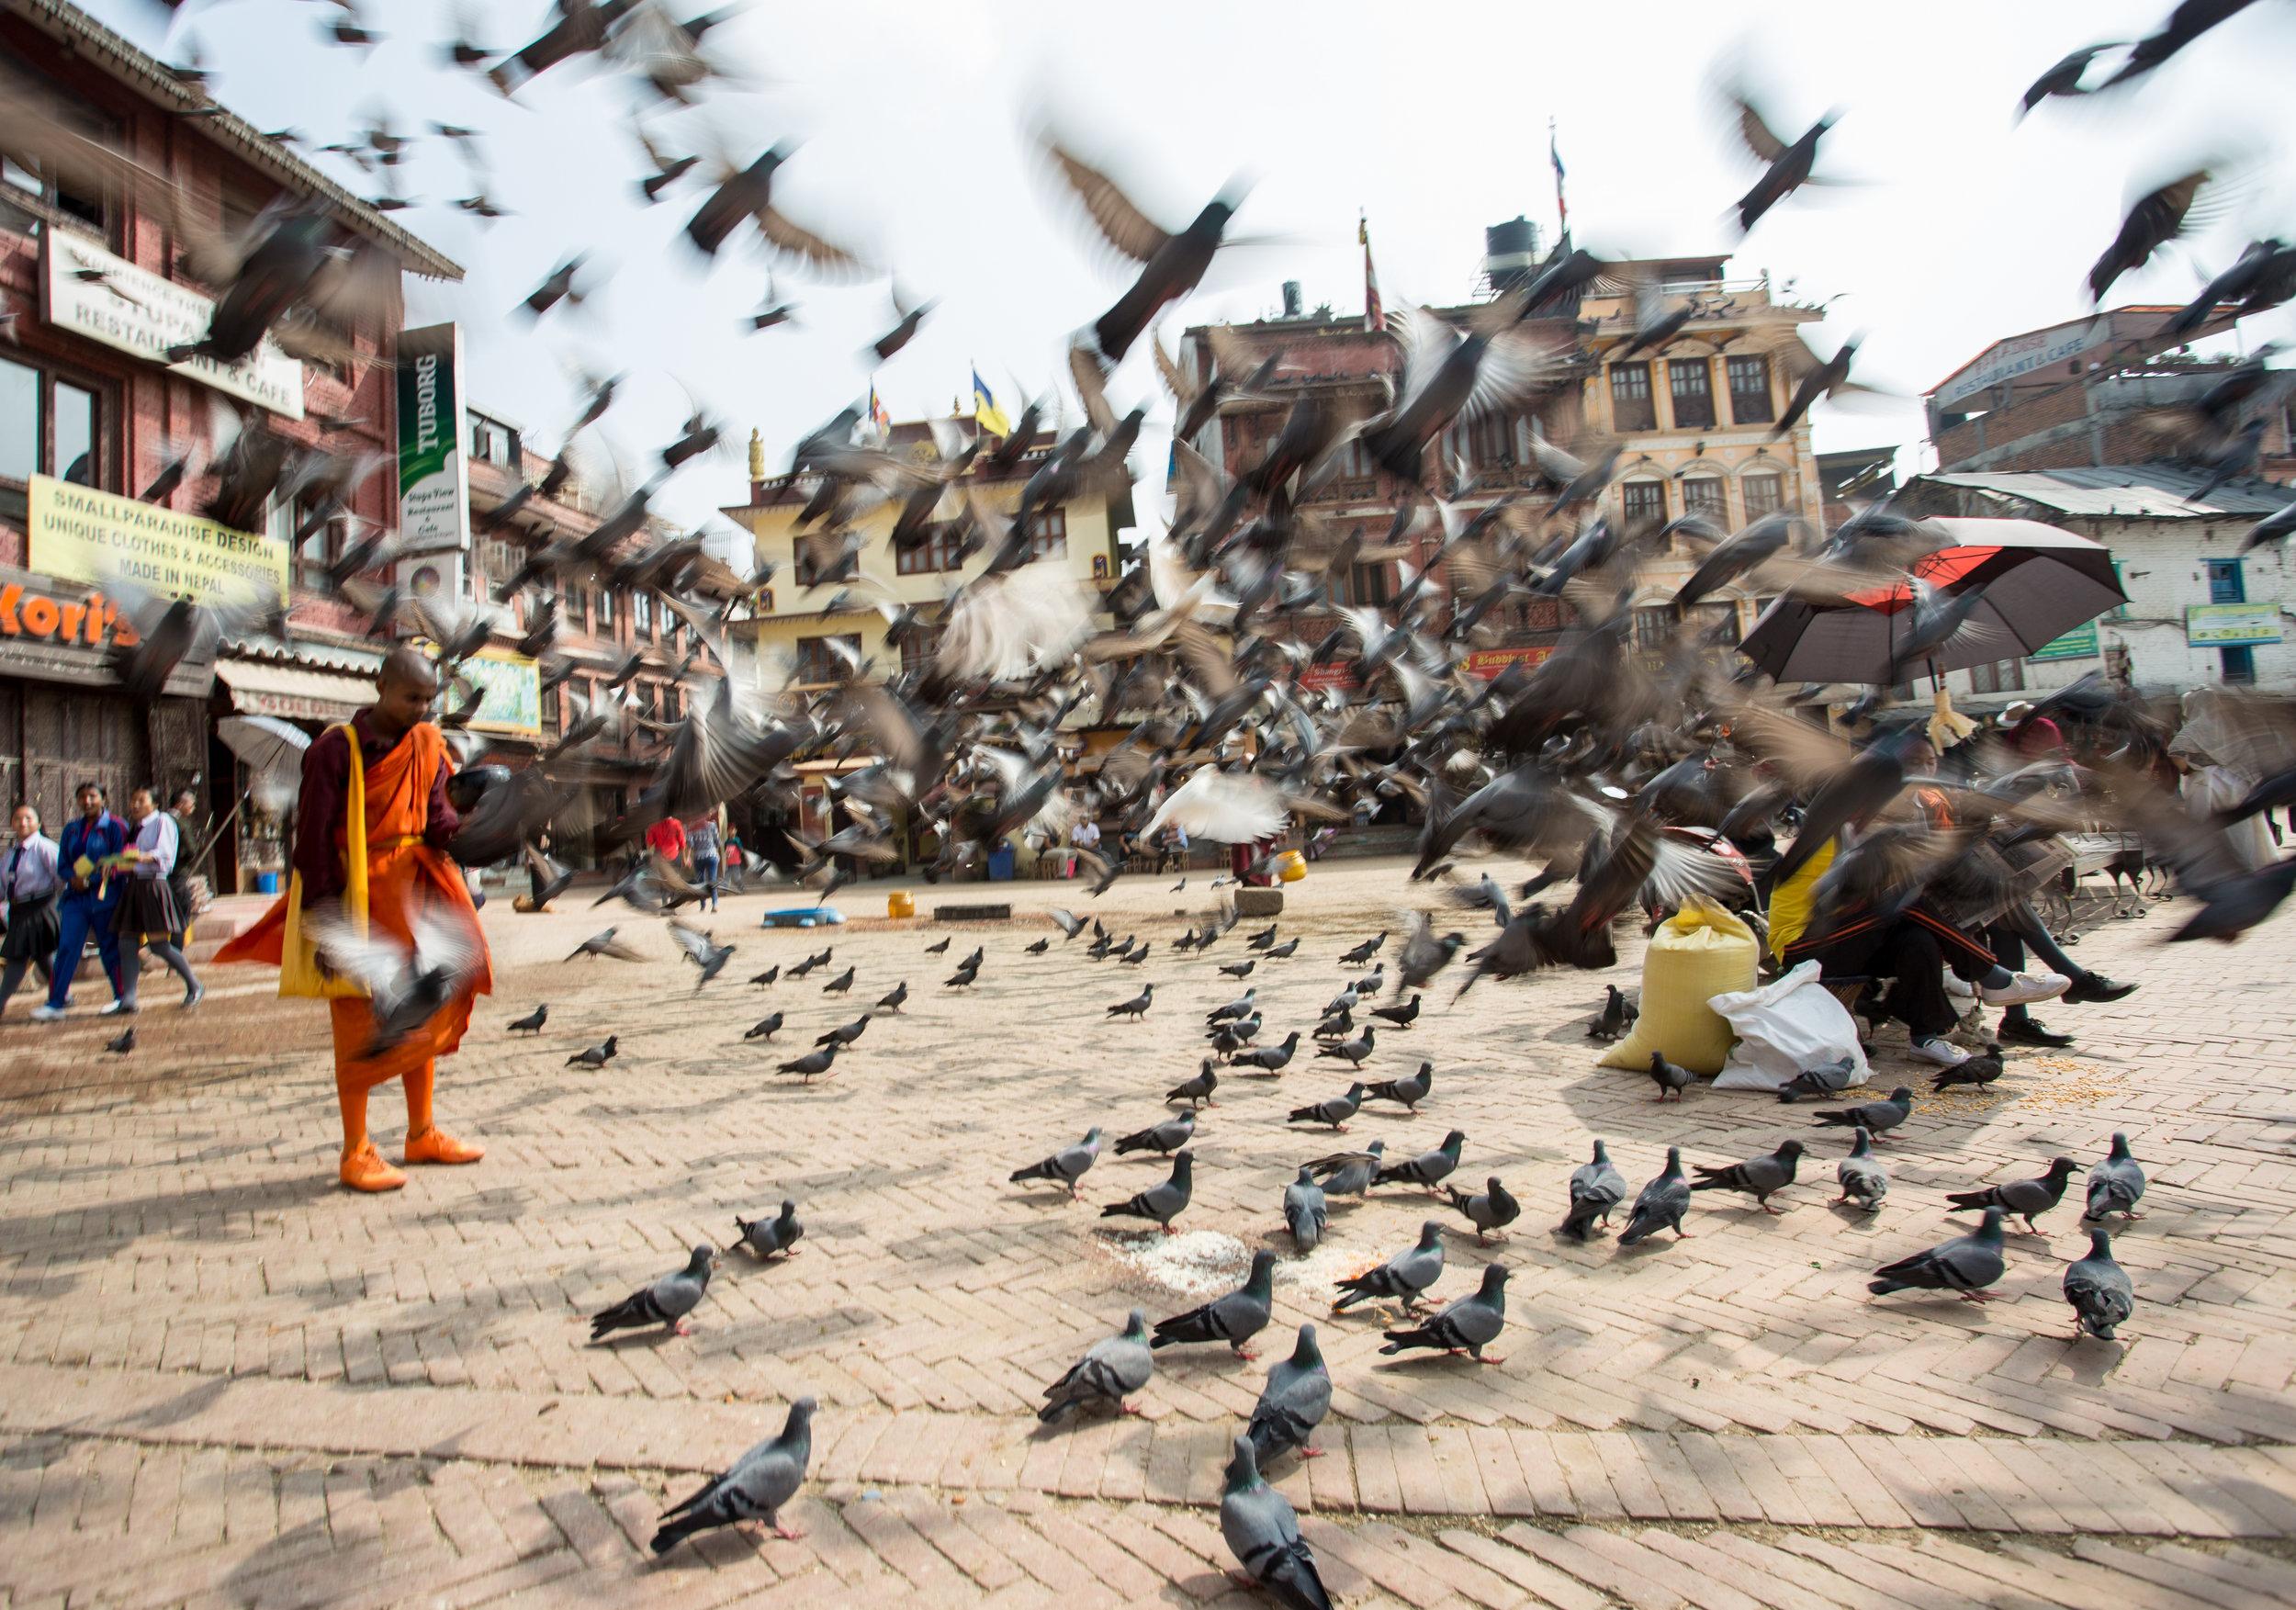 Monk feeding pigeons in Kathmandu